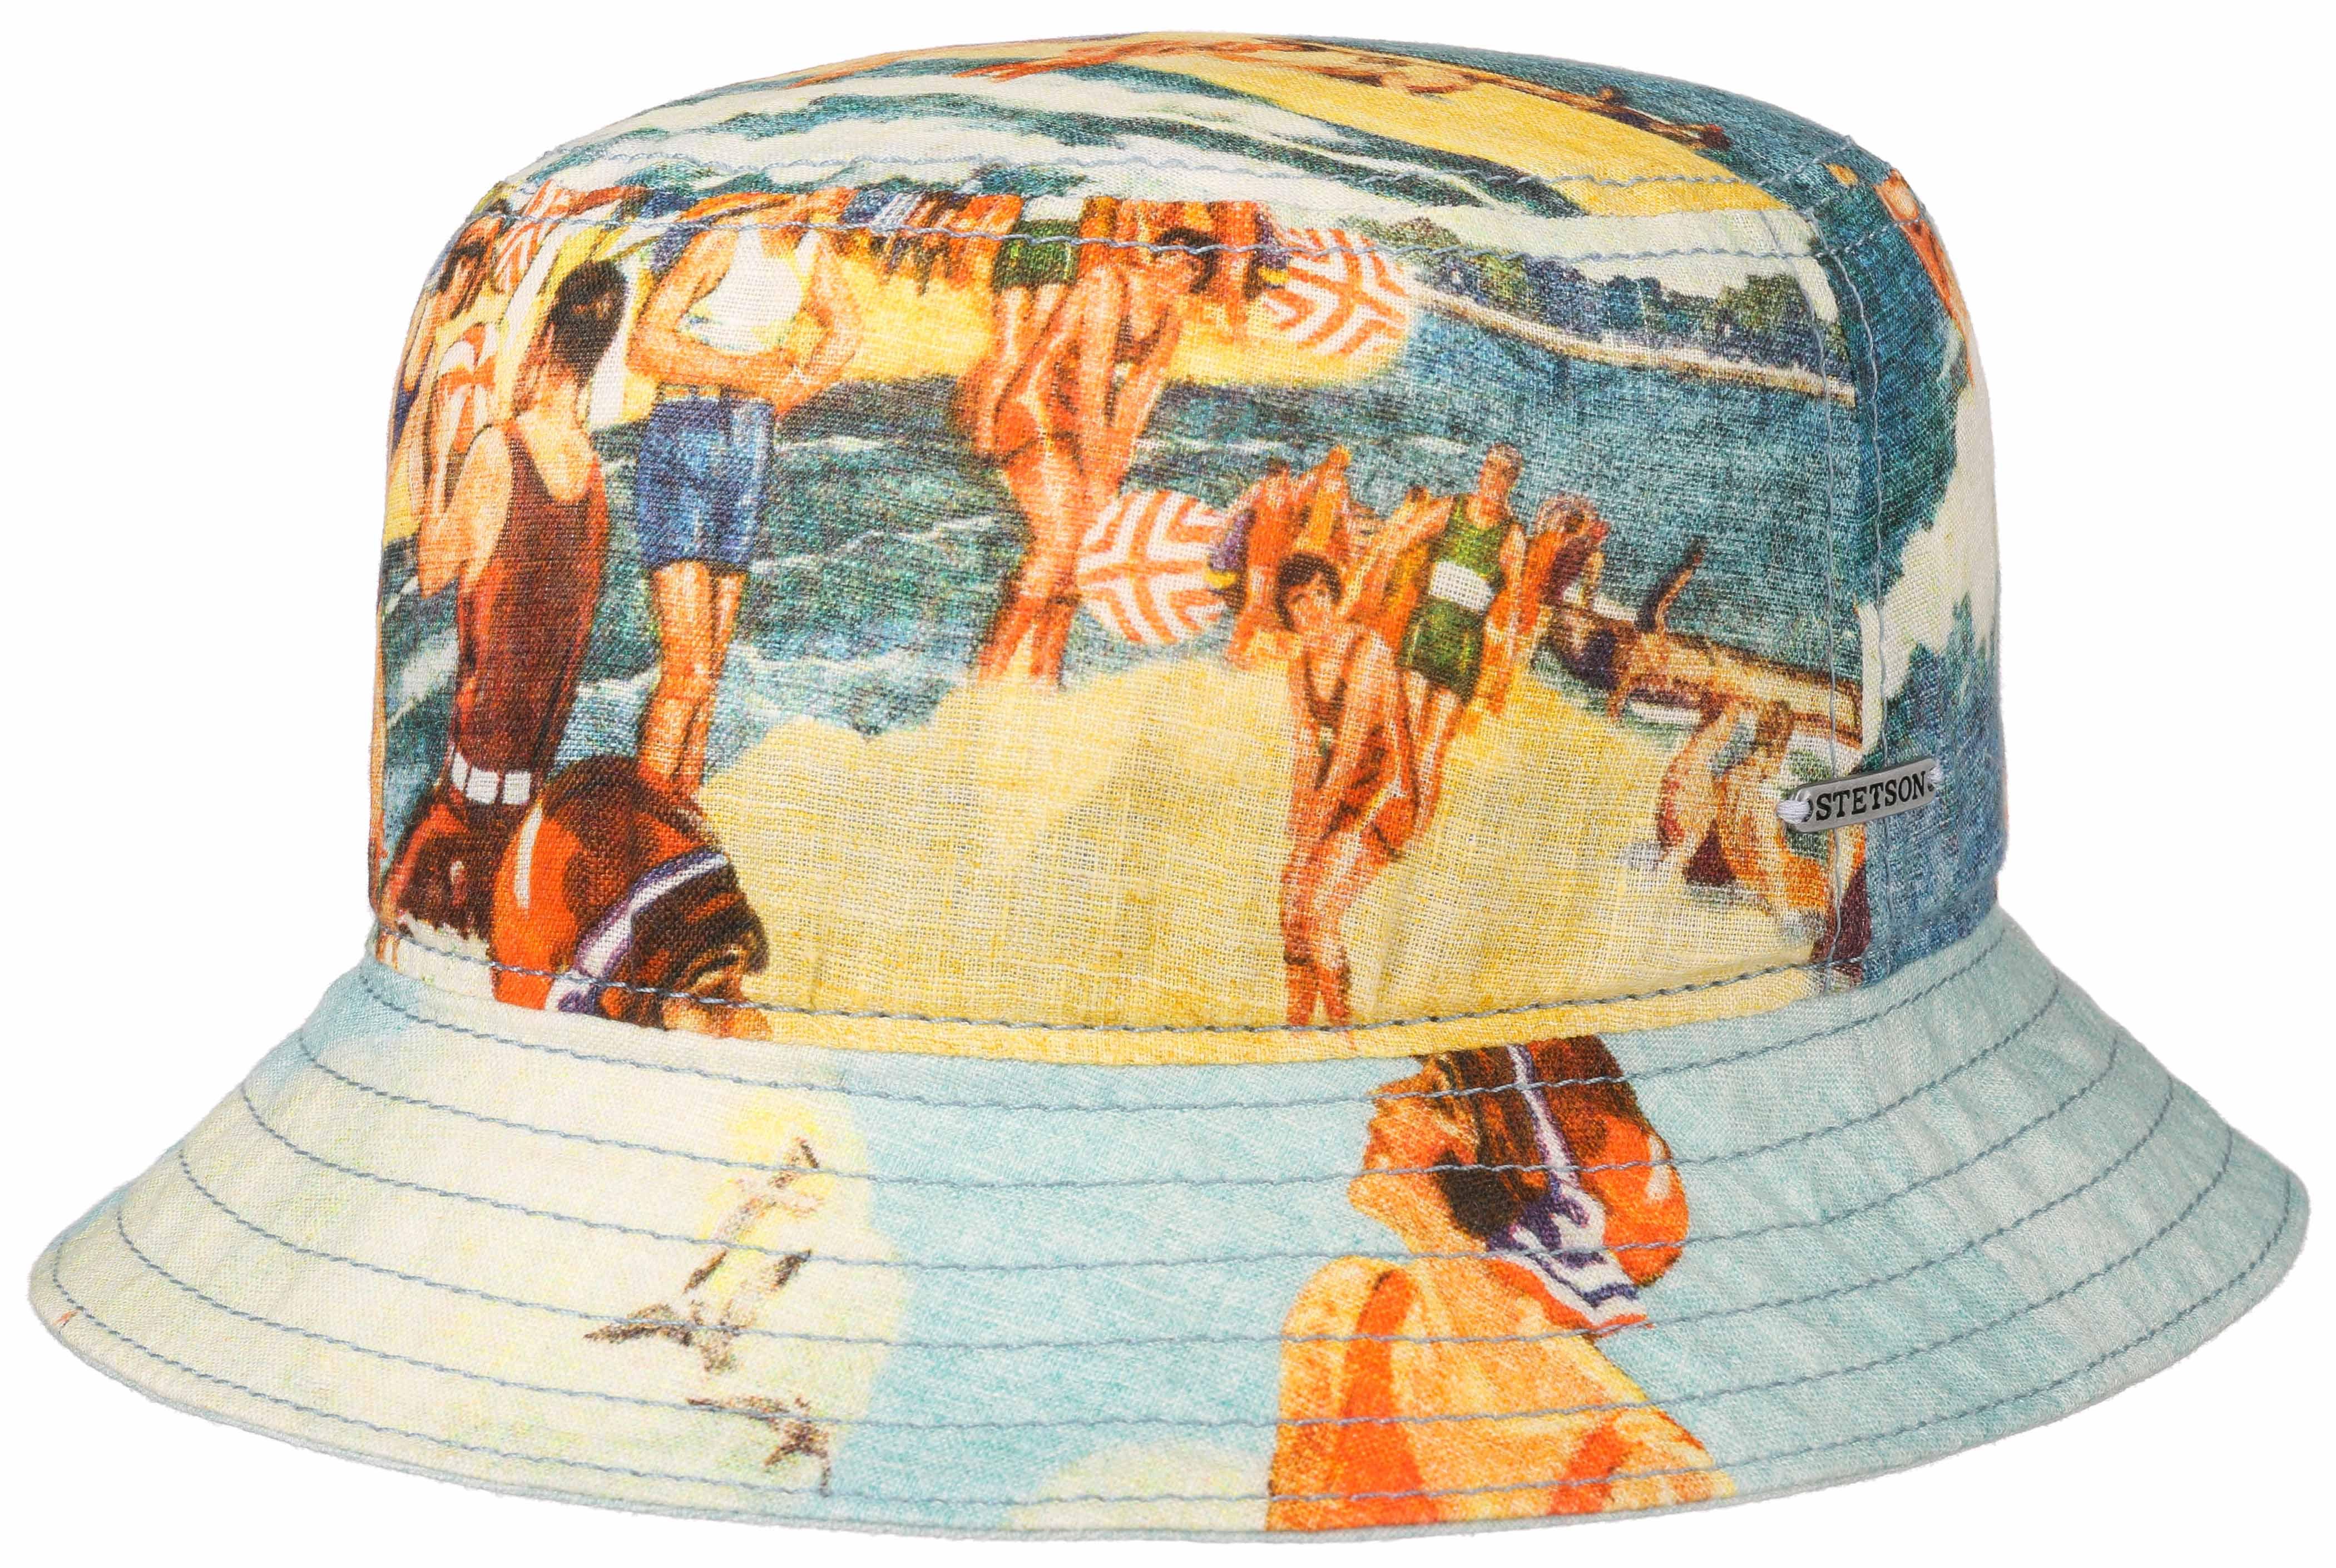 Deauville Bucket Hat